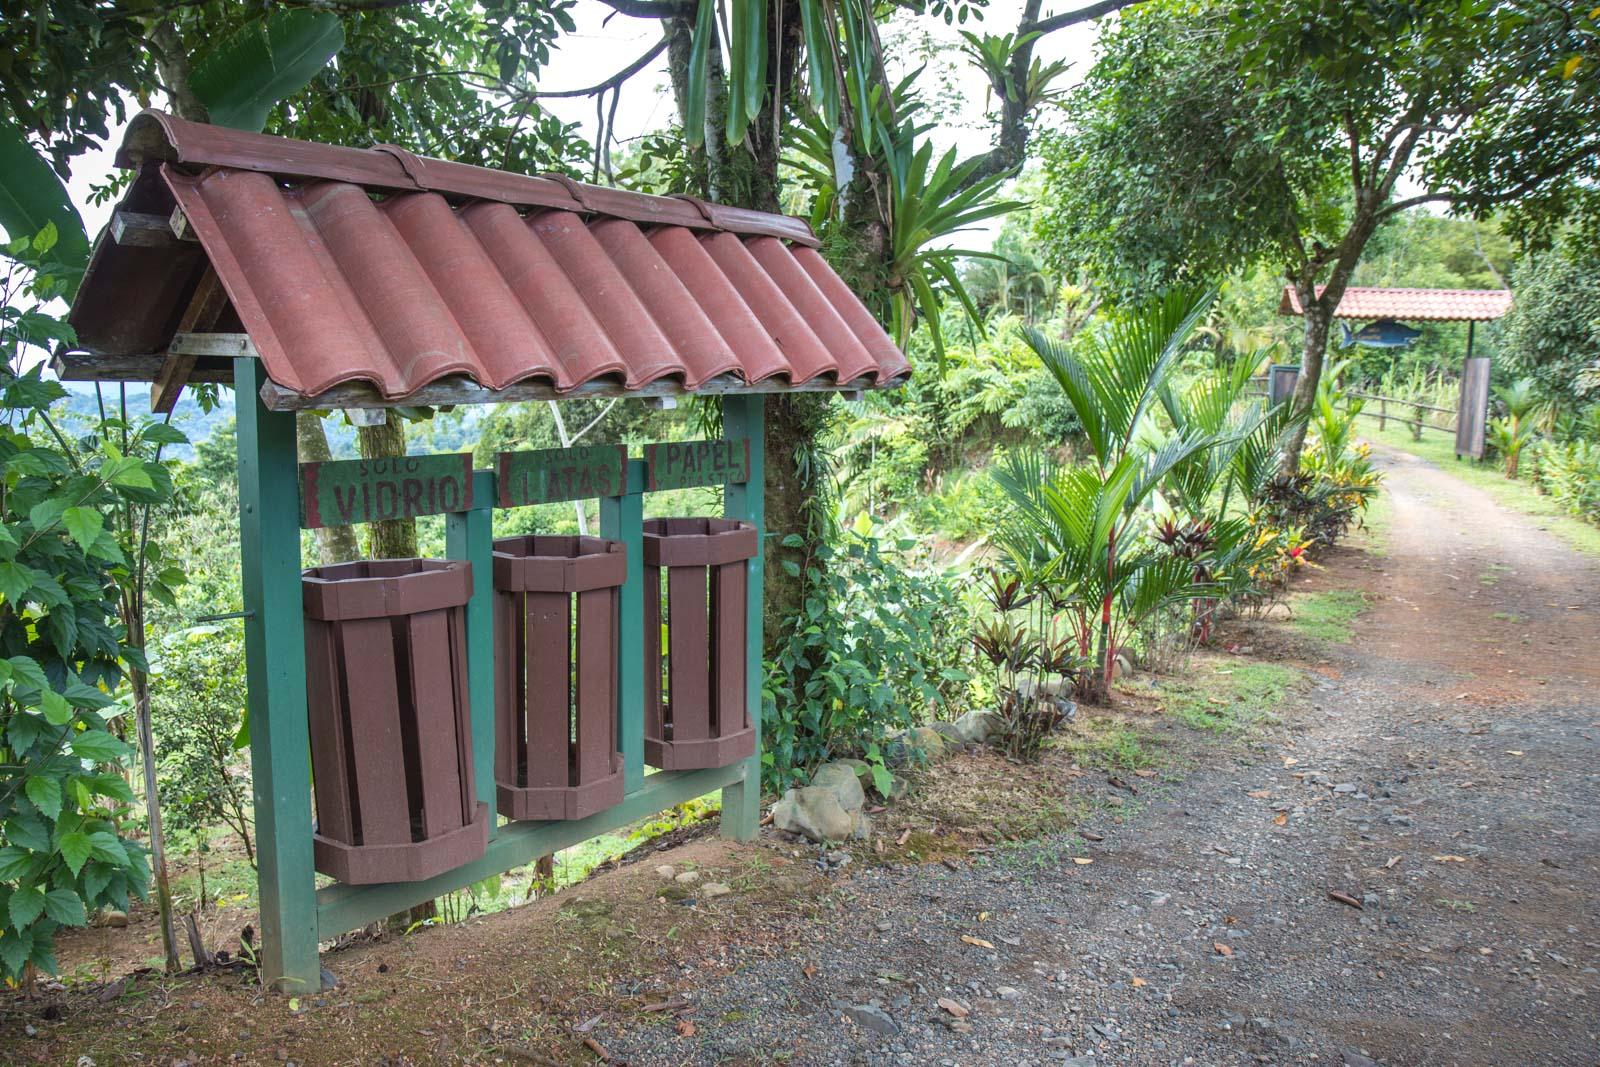 Santa Juana Rural Heritage Tour in Costa Rica